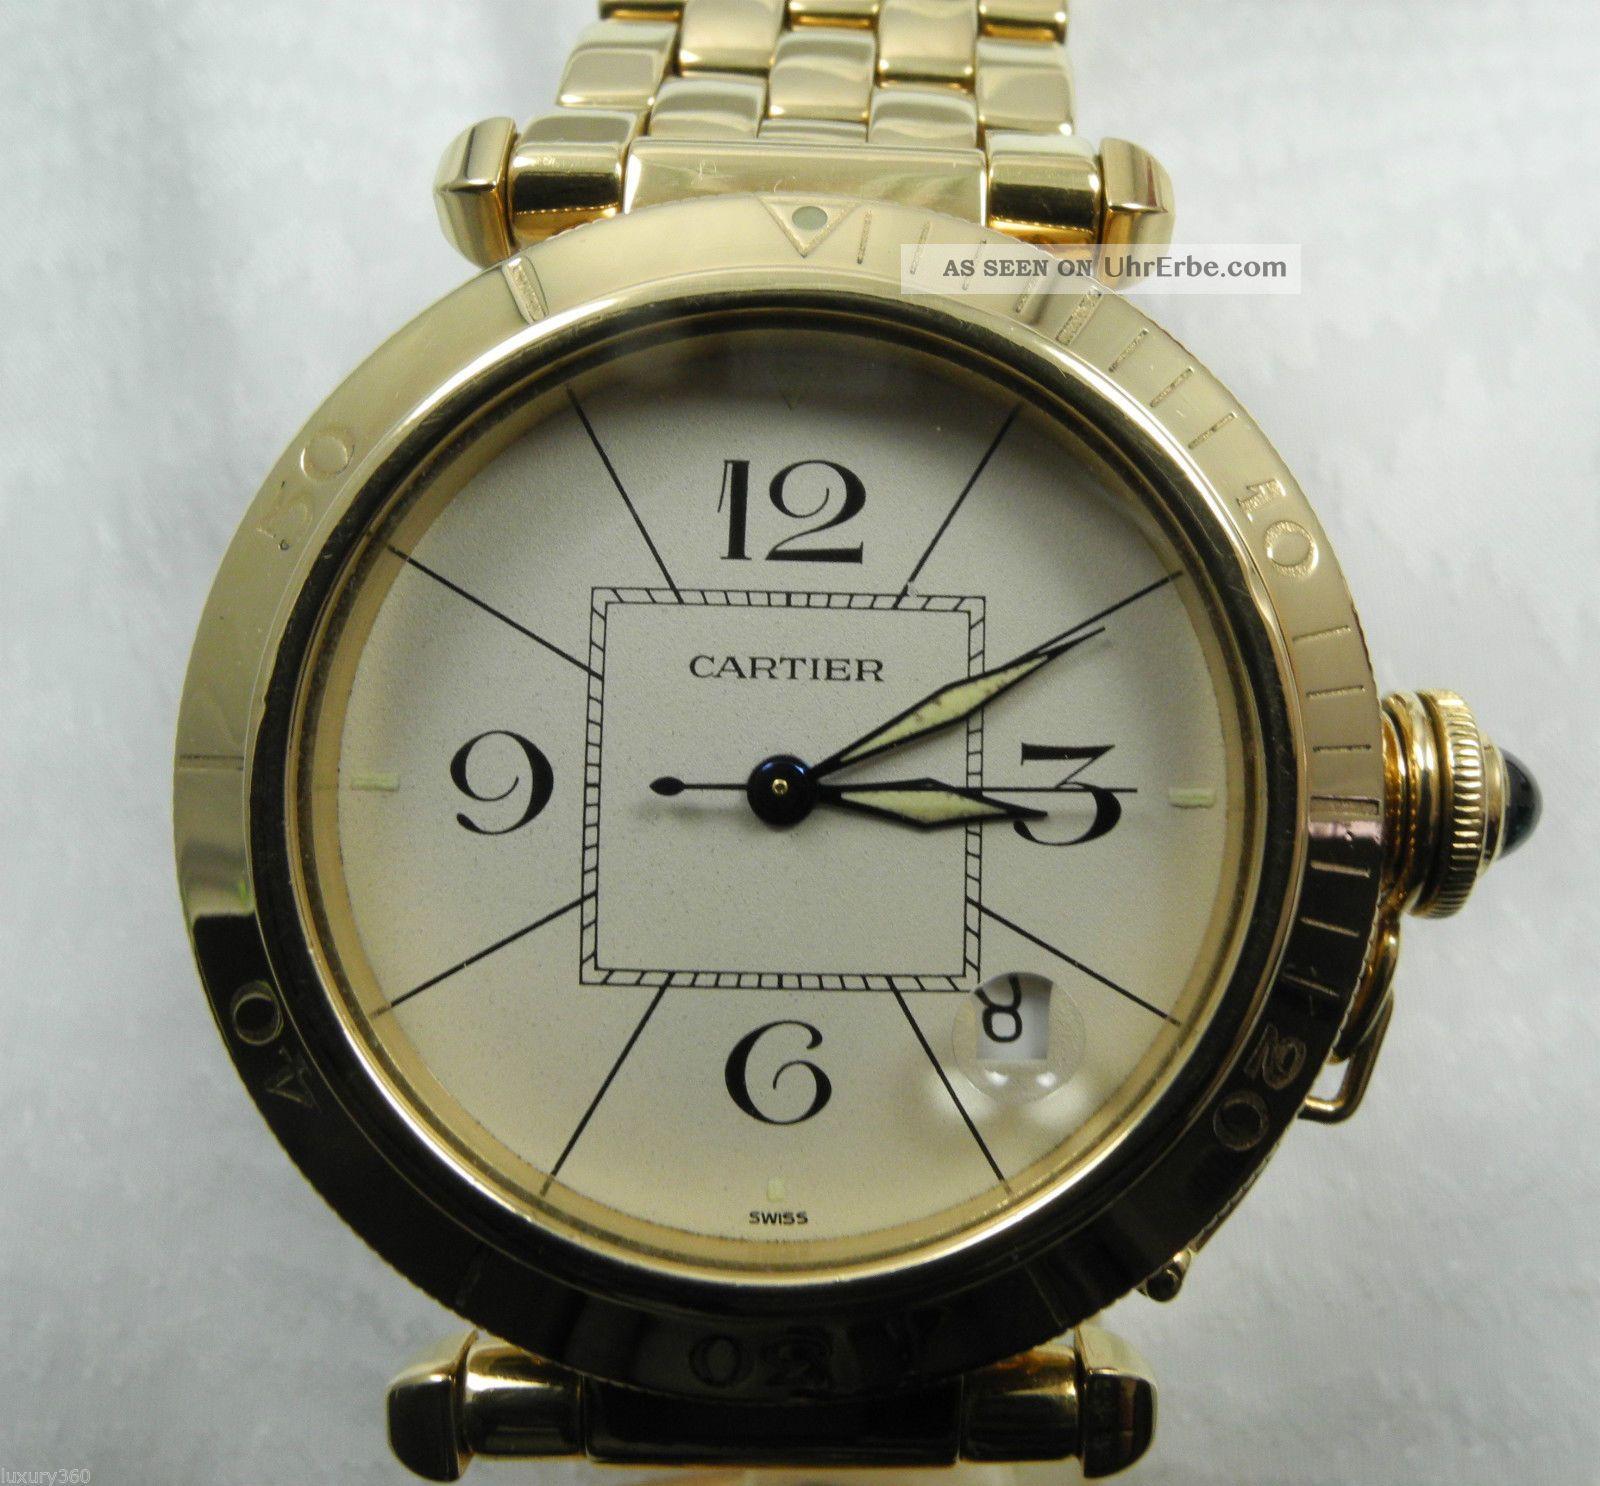 Cartier Pasha 750er Gelb Gold Automatic Uhr Armbanduhr Armbanduhren Bild